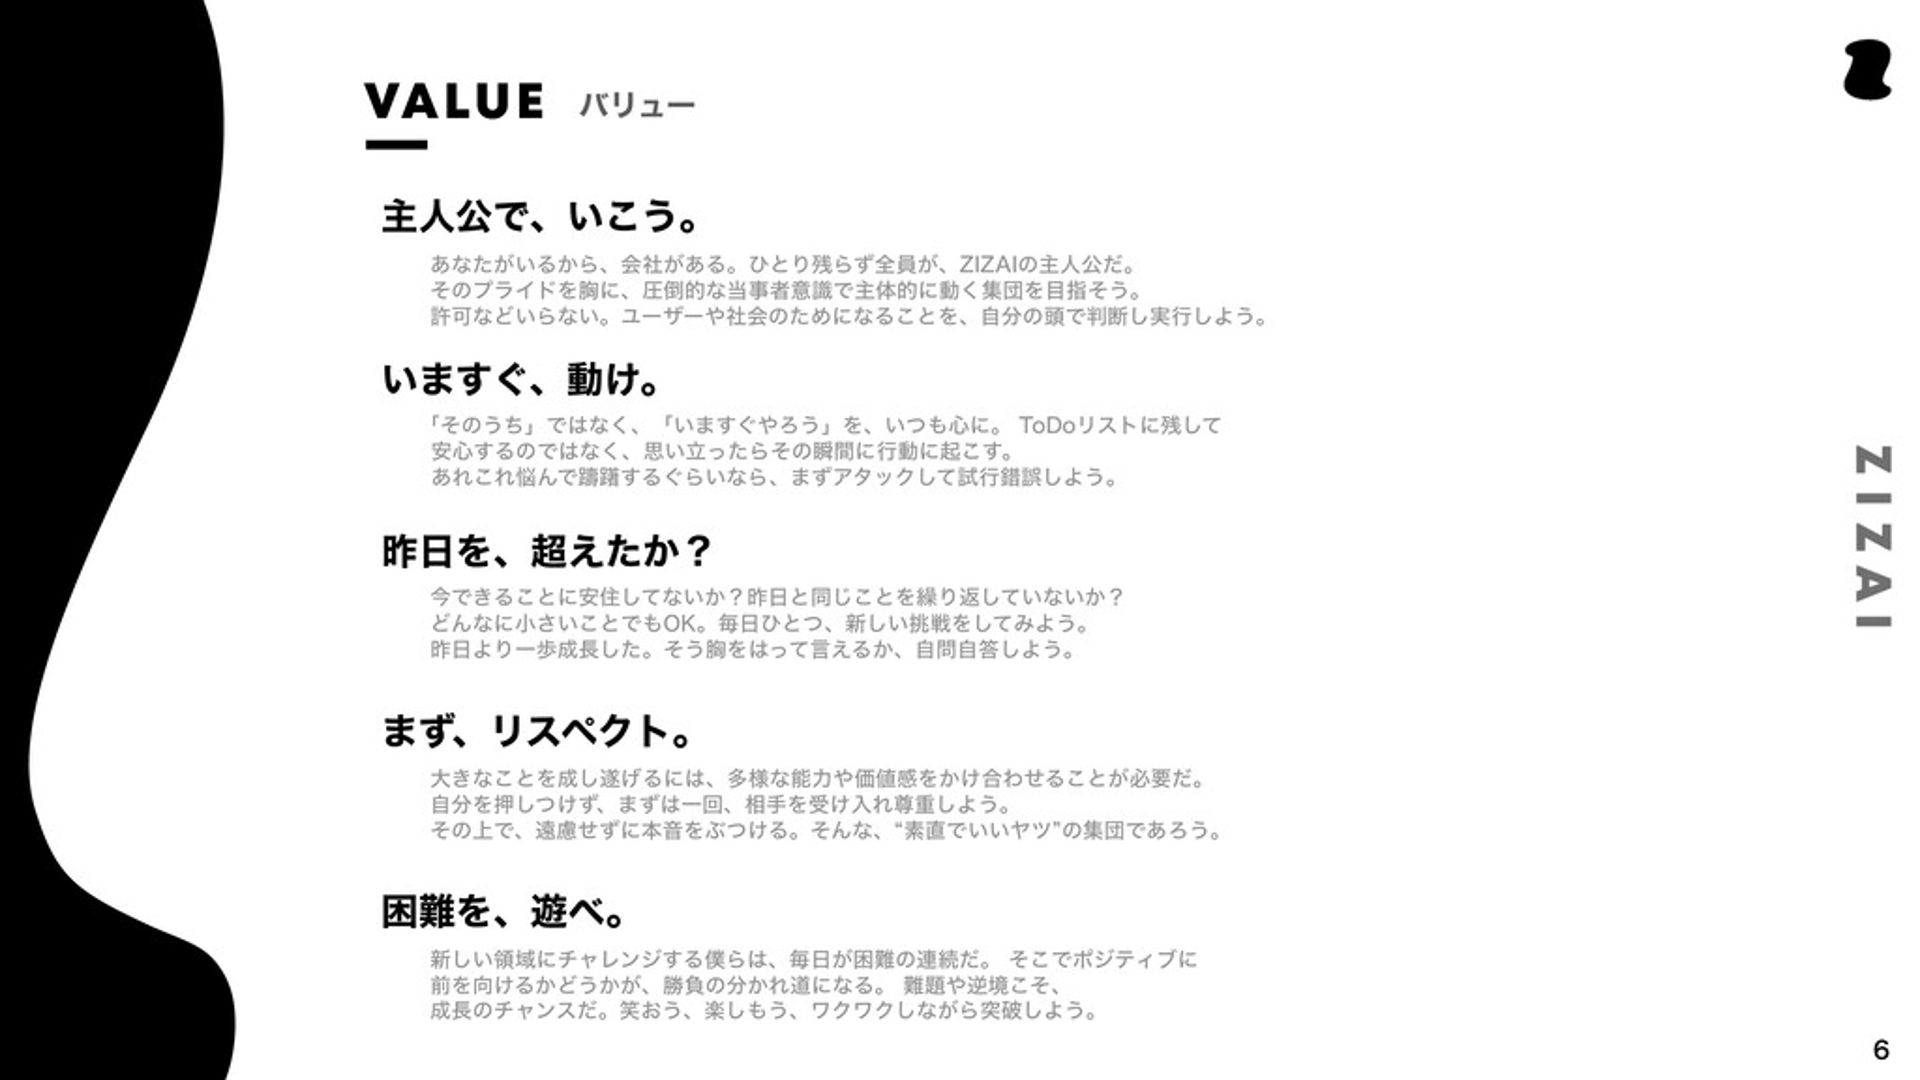 VALUE όϦϡʔ ओਓެͰɺ͍͜͏ɻ ͍·͙͢ɺಈ͚ɻ ࡢΛɺ͔͑ͨʁ ·ͣɺϦε...